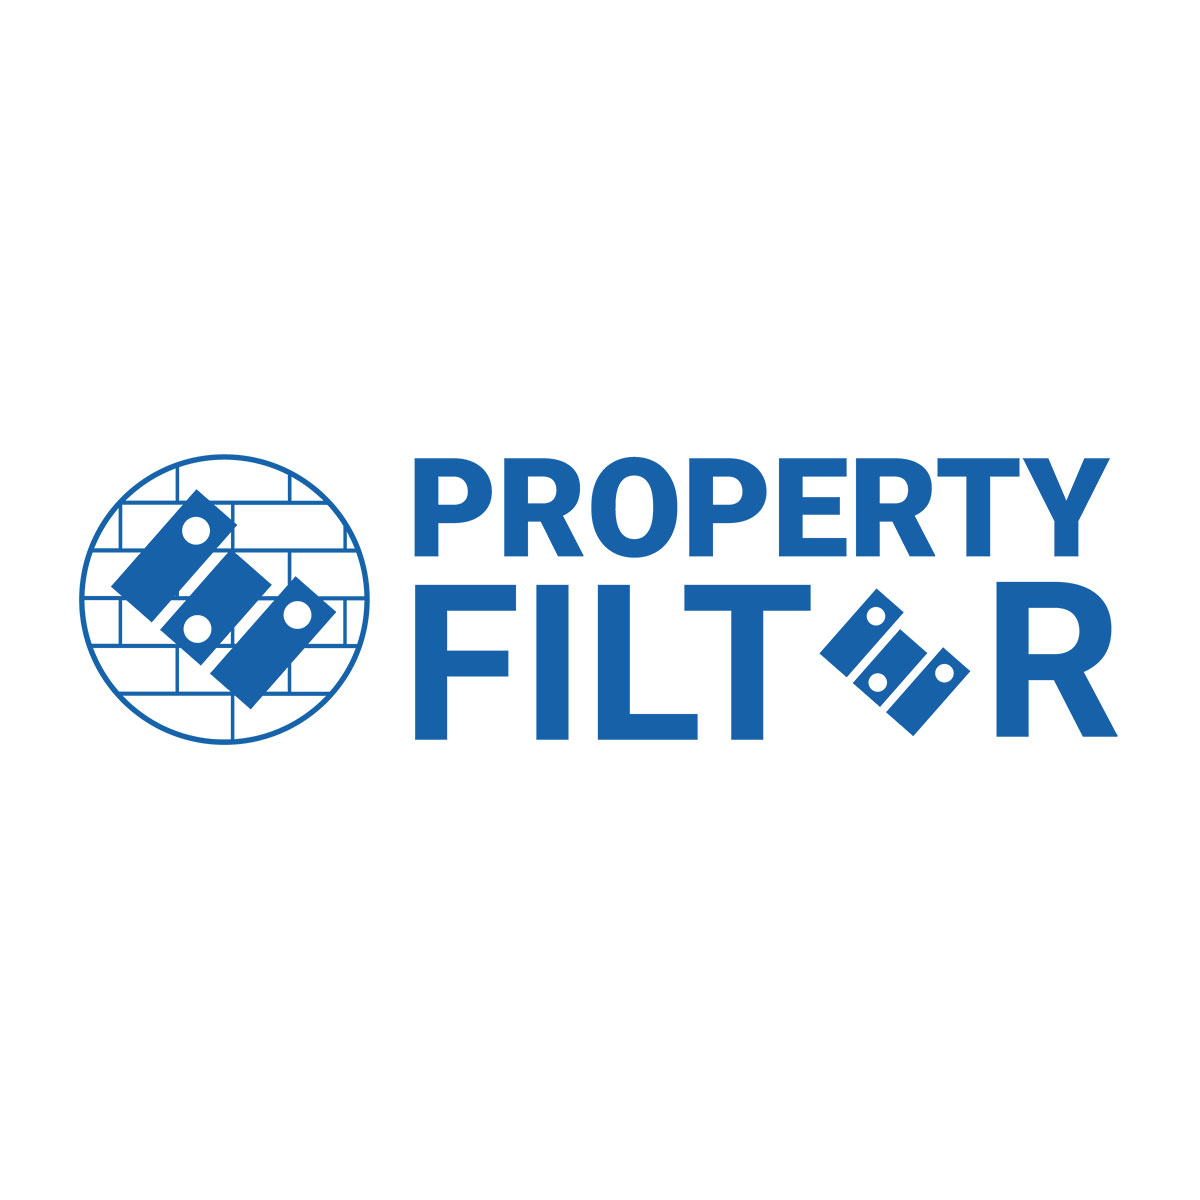 Property Filter custom logo design